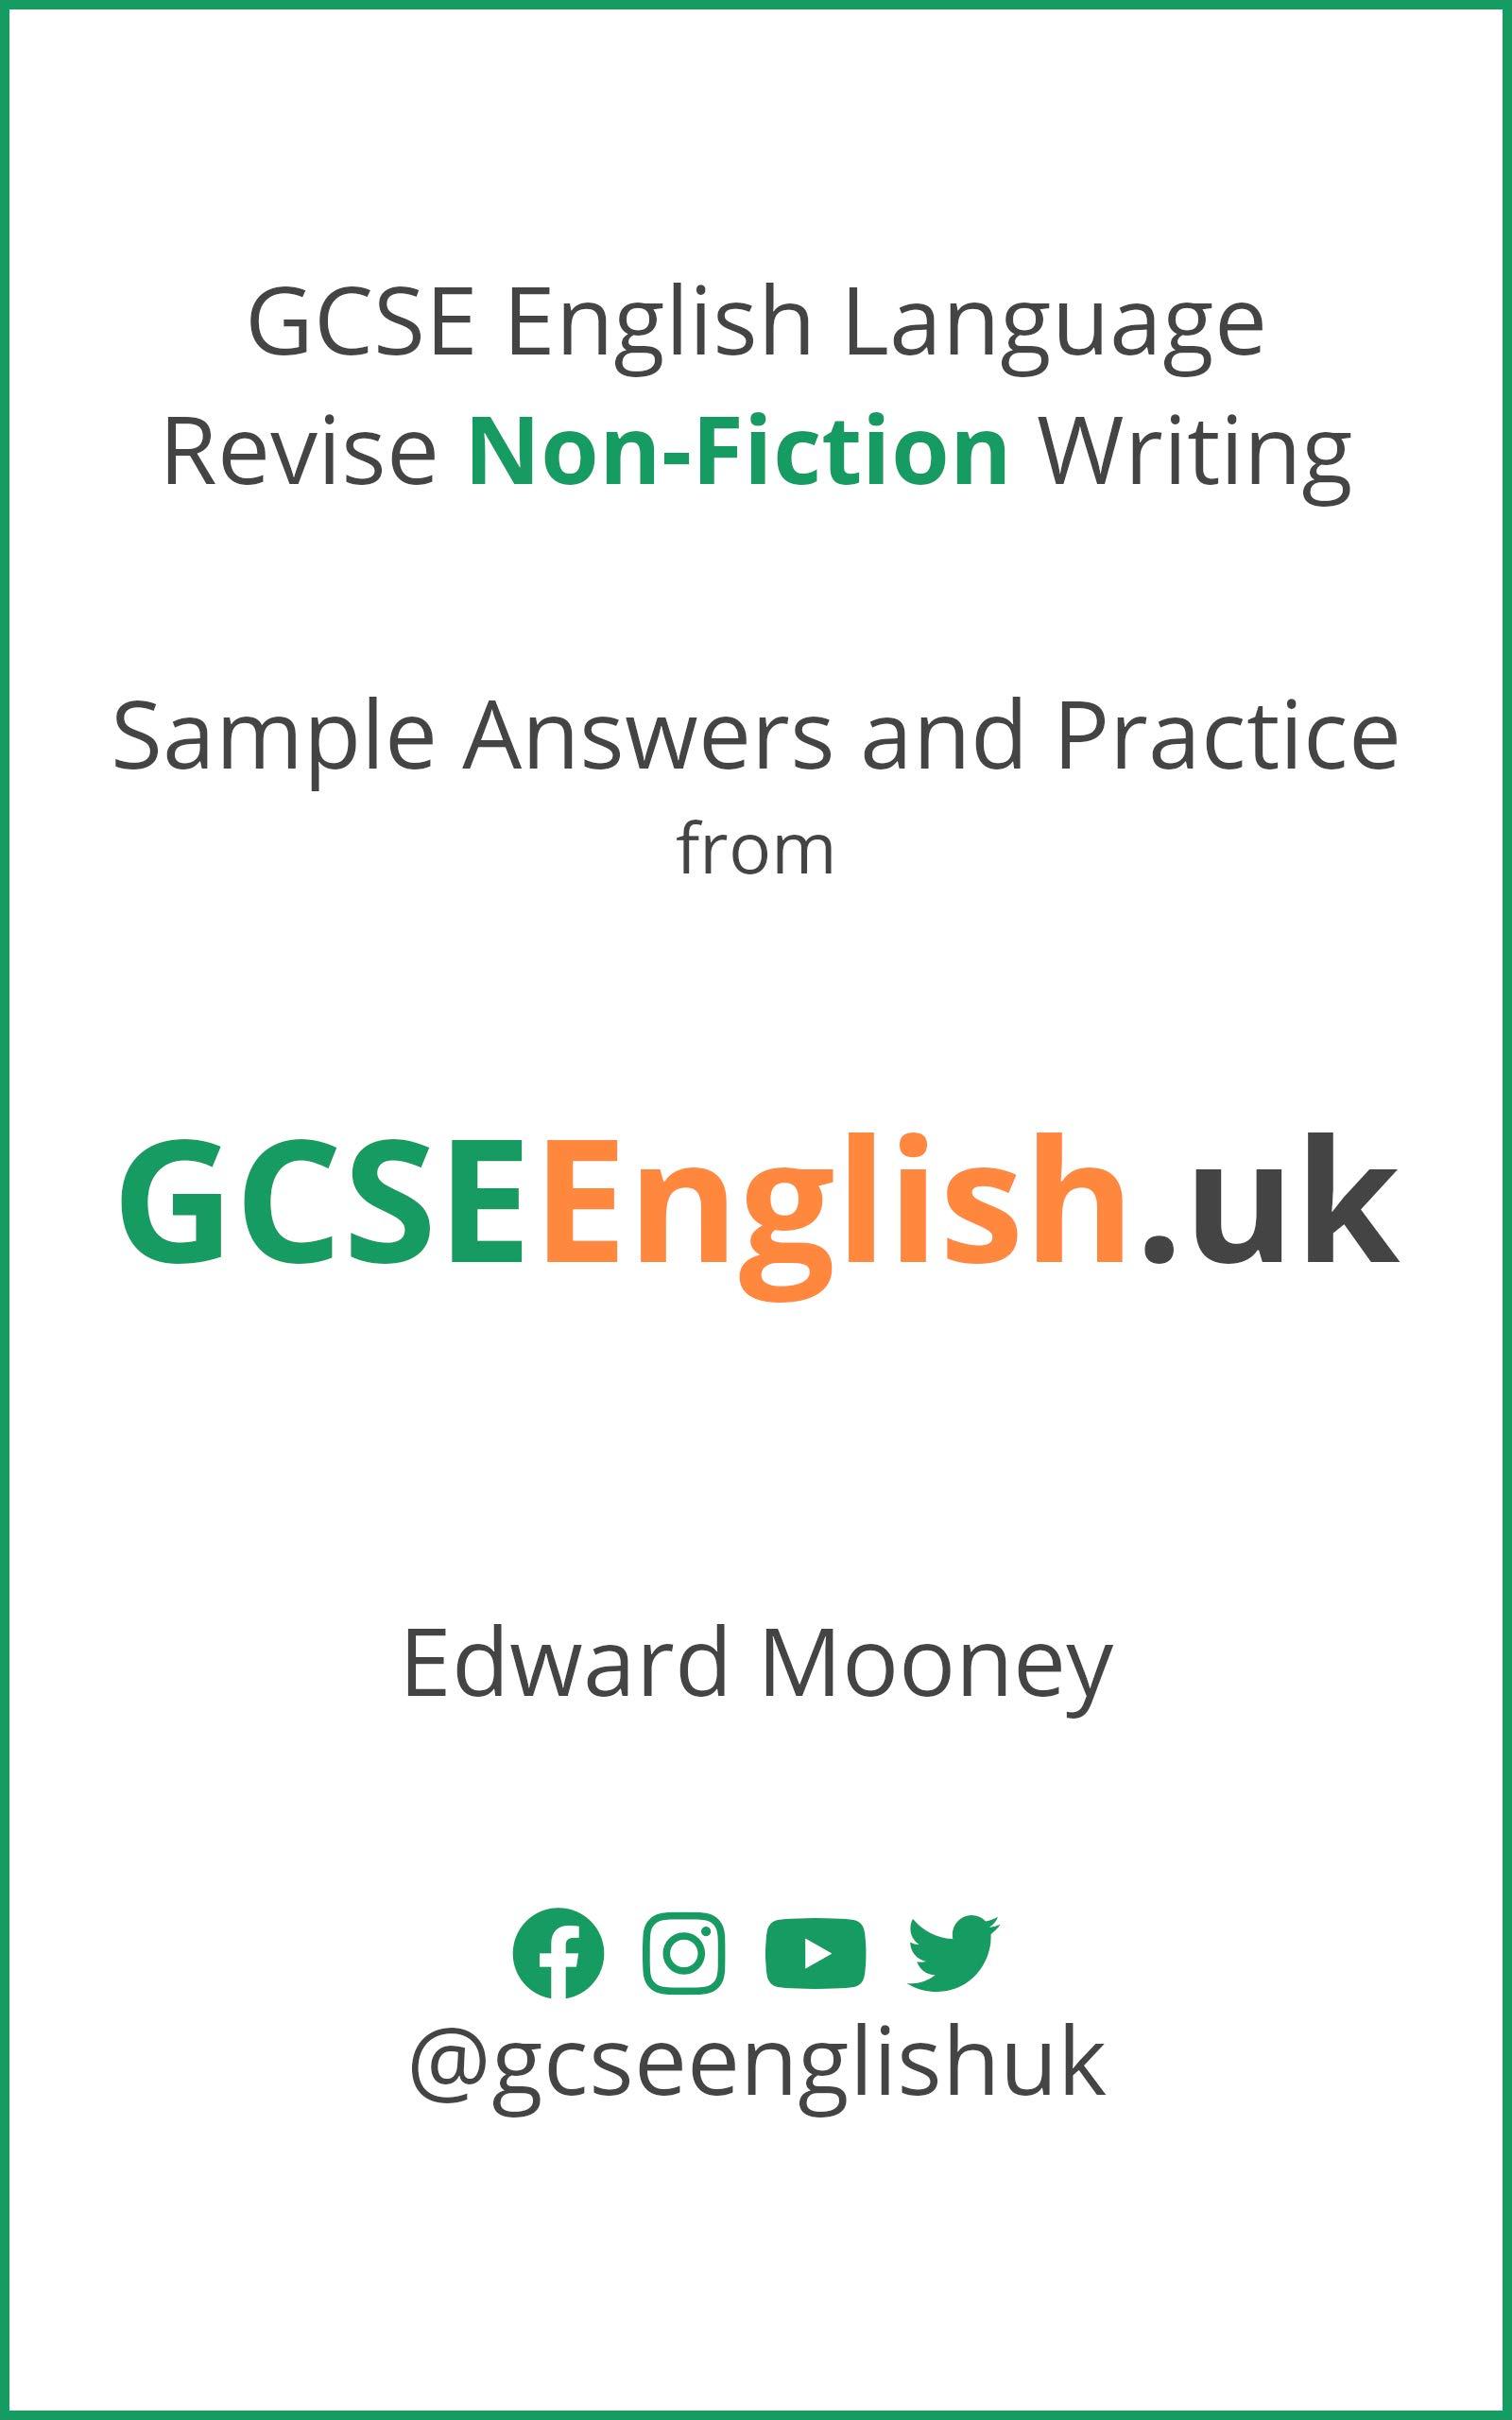 GCSE English Language Revise Non-Fiction Writing Sample Answers and Practice: from GCSEEnglish.uk